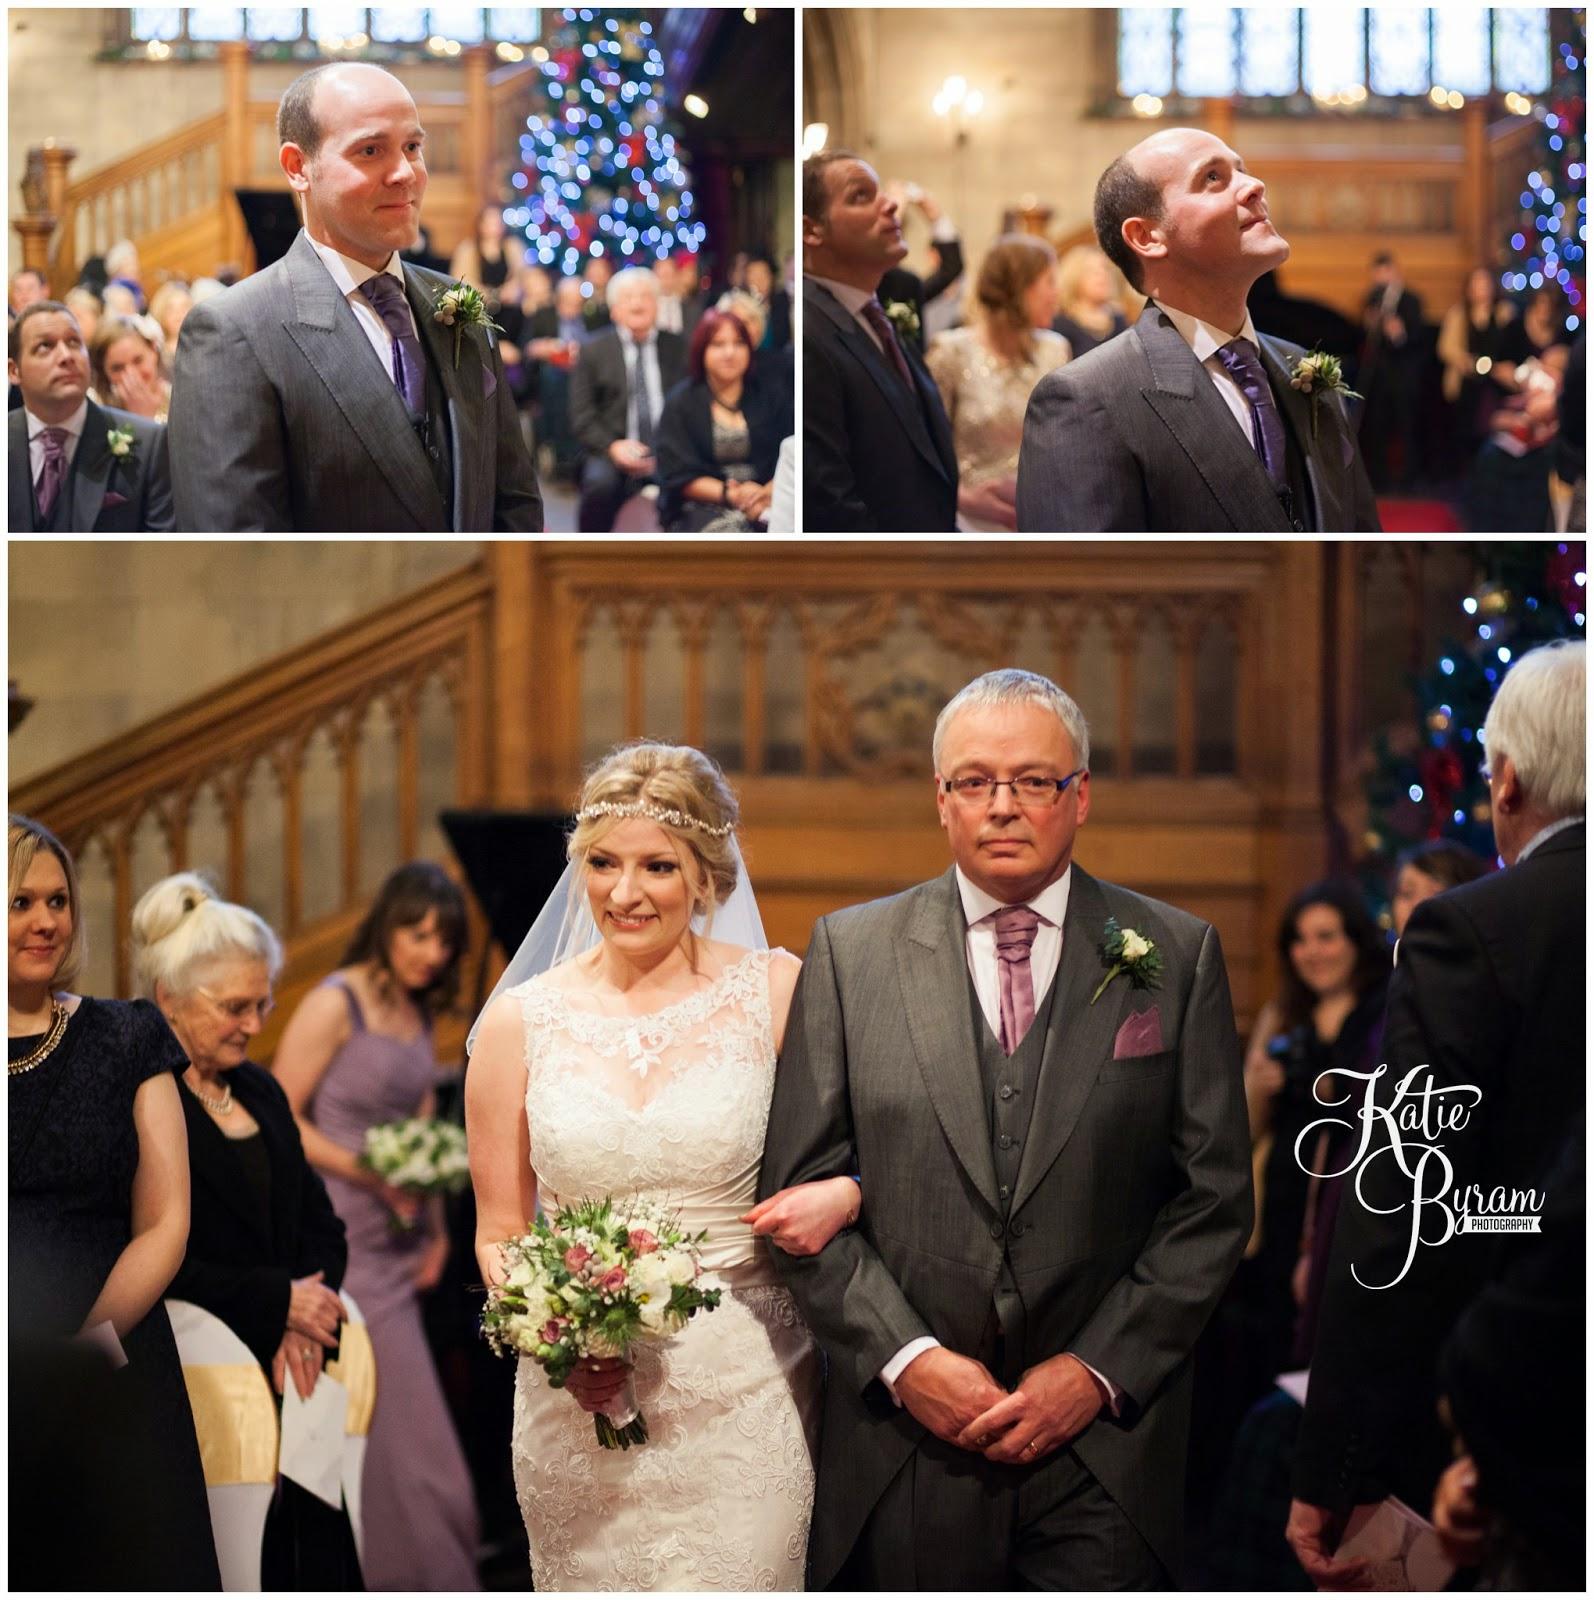 matfen hall wedding, winter wedding northumberland, share the honest love, love my dress blog, katie byram photography